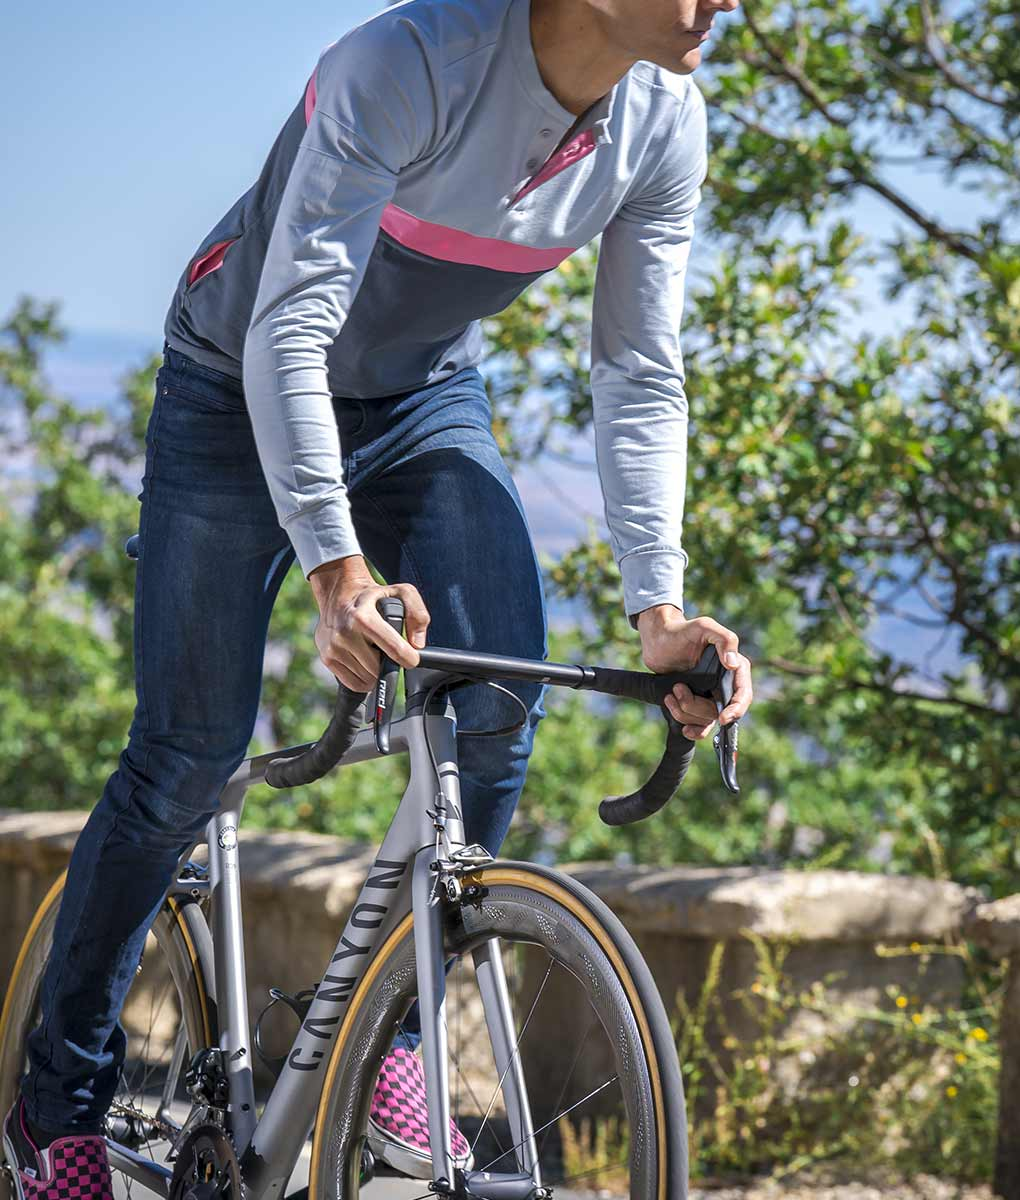 casual-cycling-polo-sport-bike